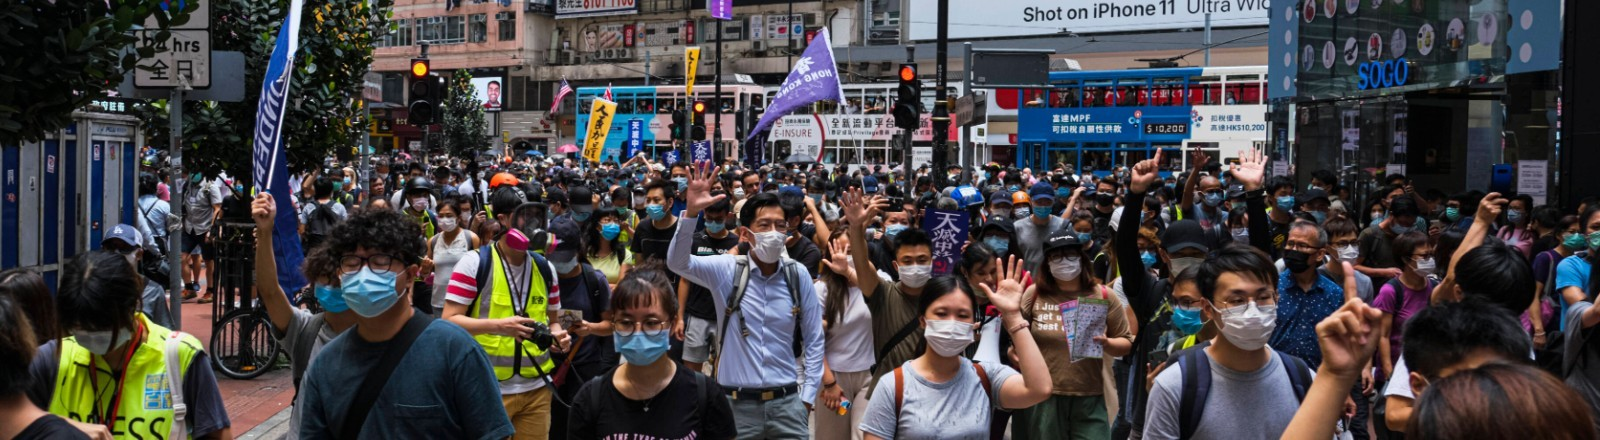 Protest in Hongkong am 24.05.2020